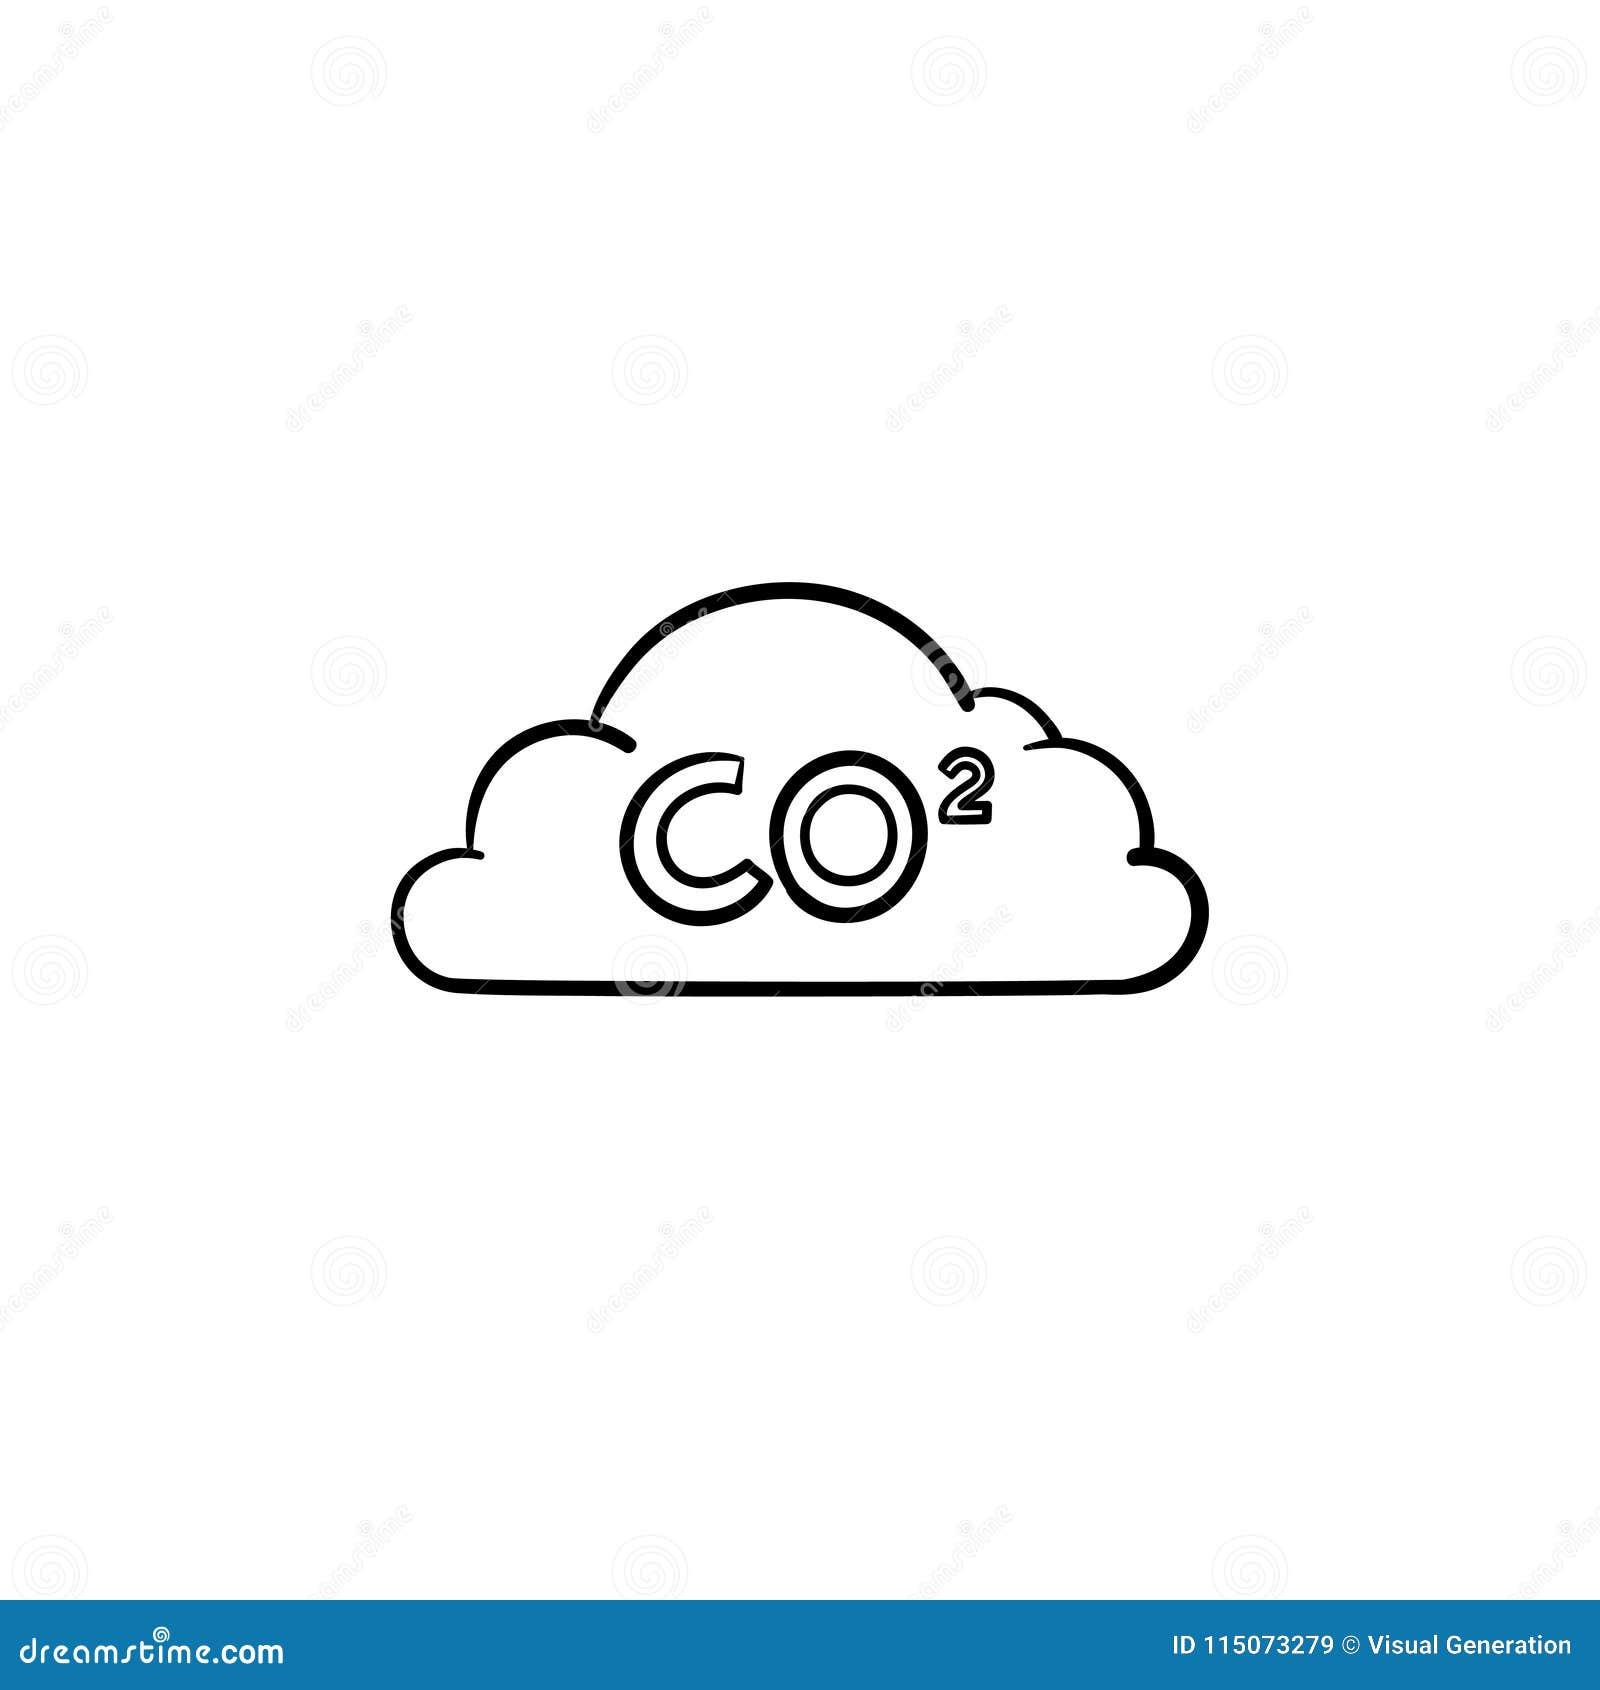 CO2 cloud hand drawn sketch icon.